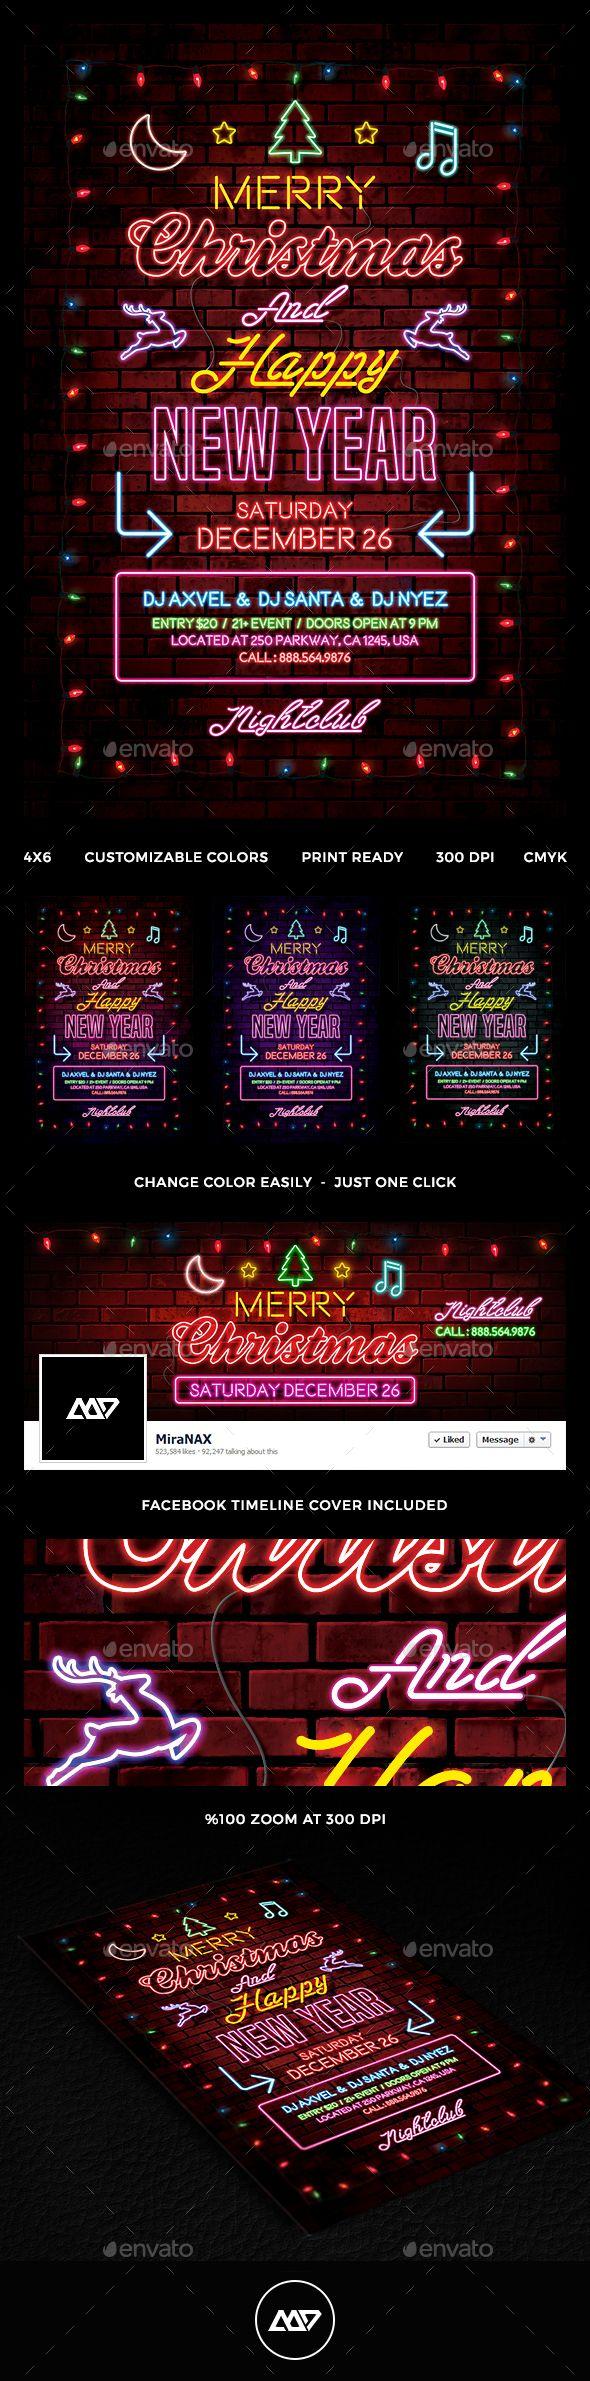 i do like christmas - Christmas Poster Ideas